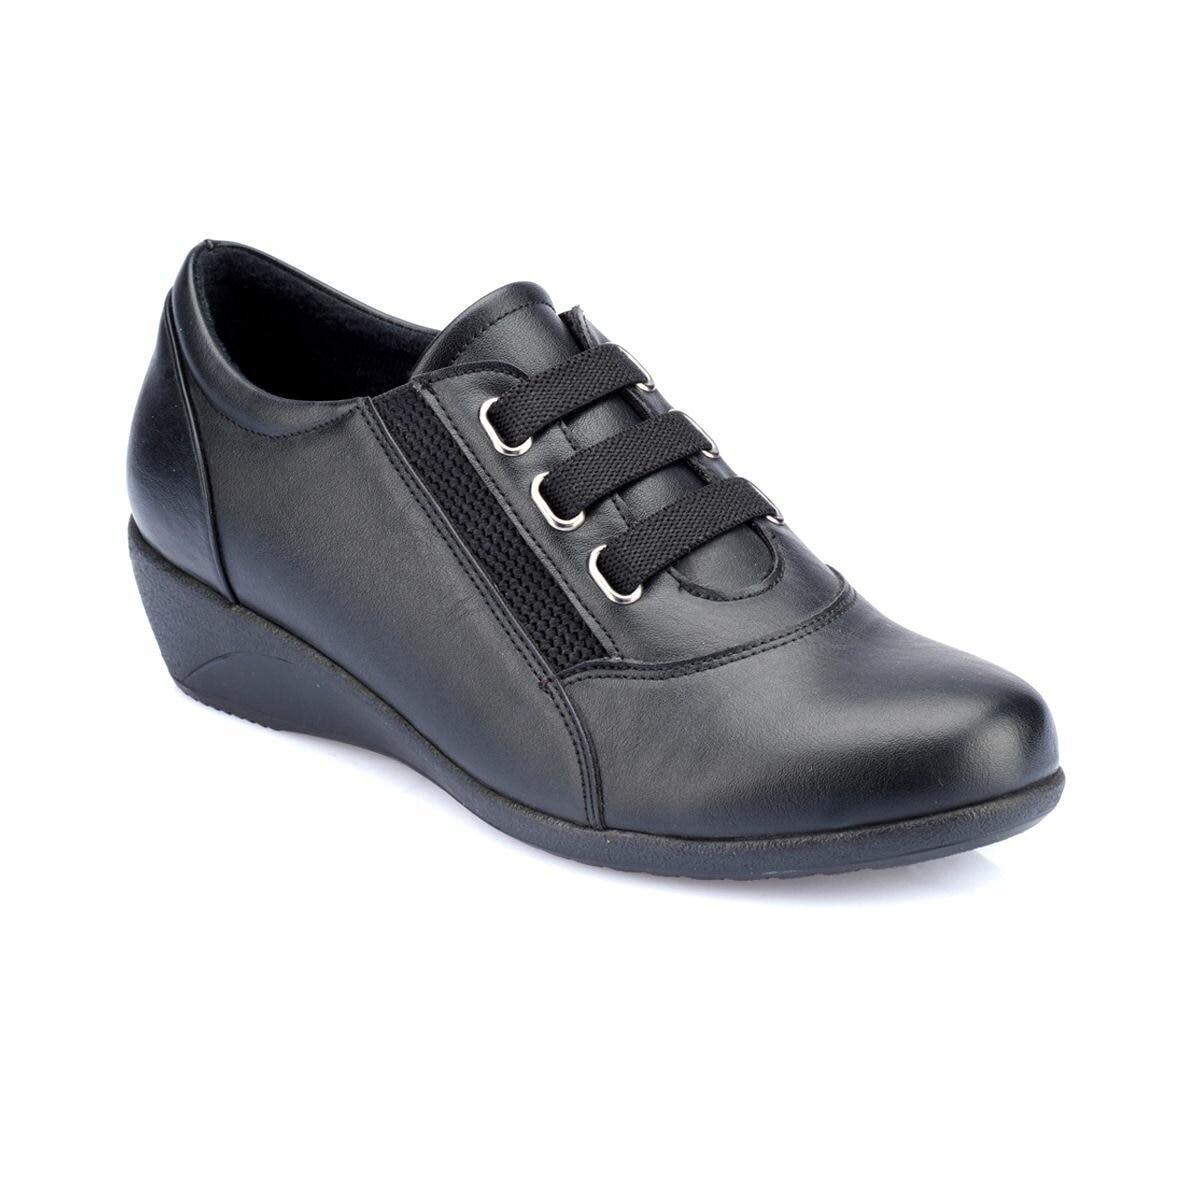 FLO 82.150027.Z Black Women Shoes Polaris